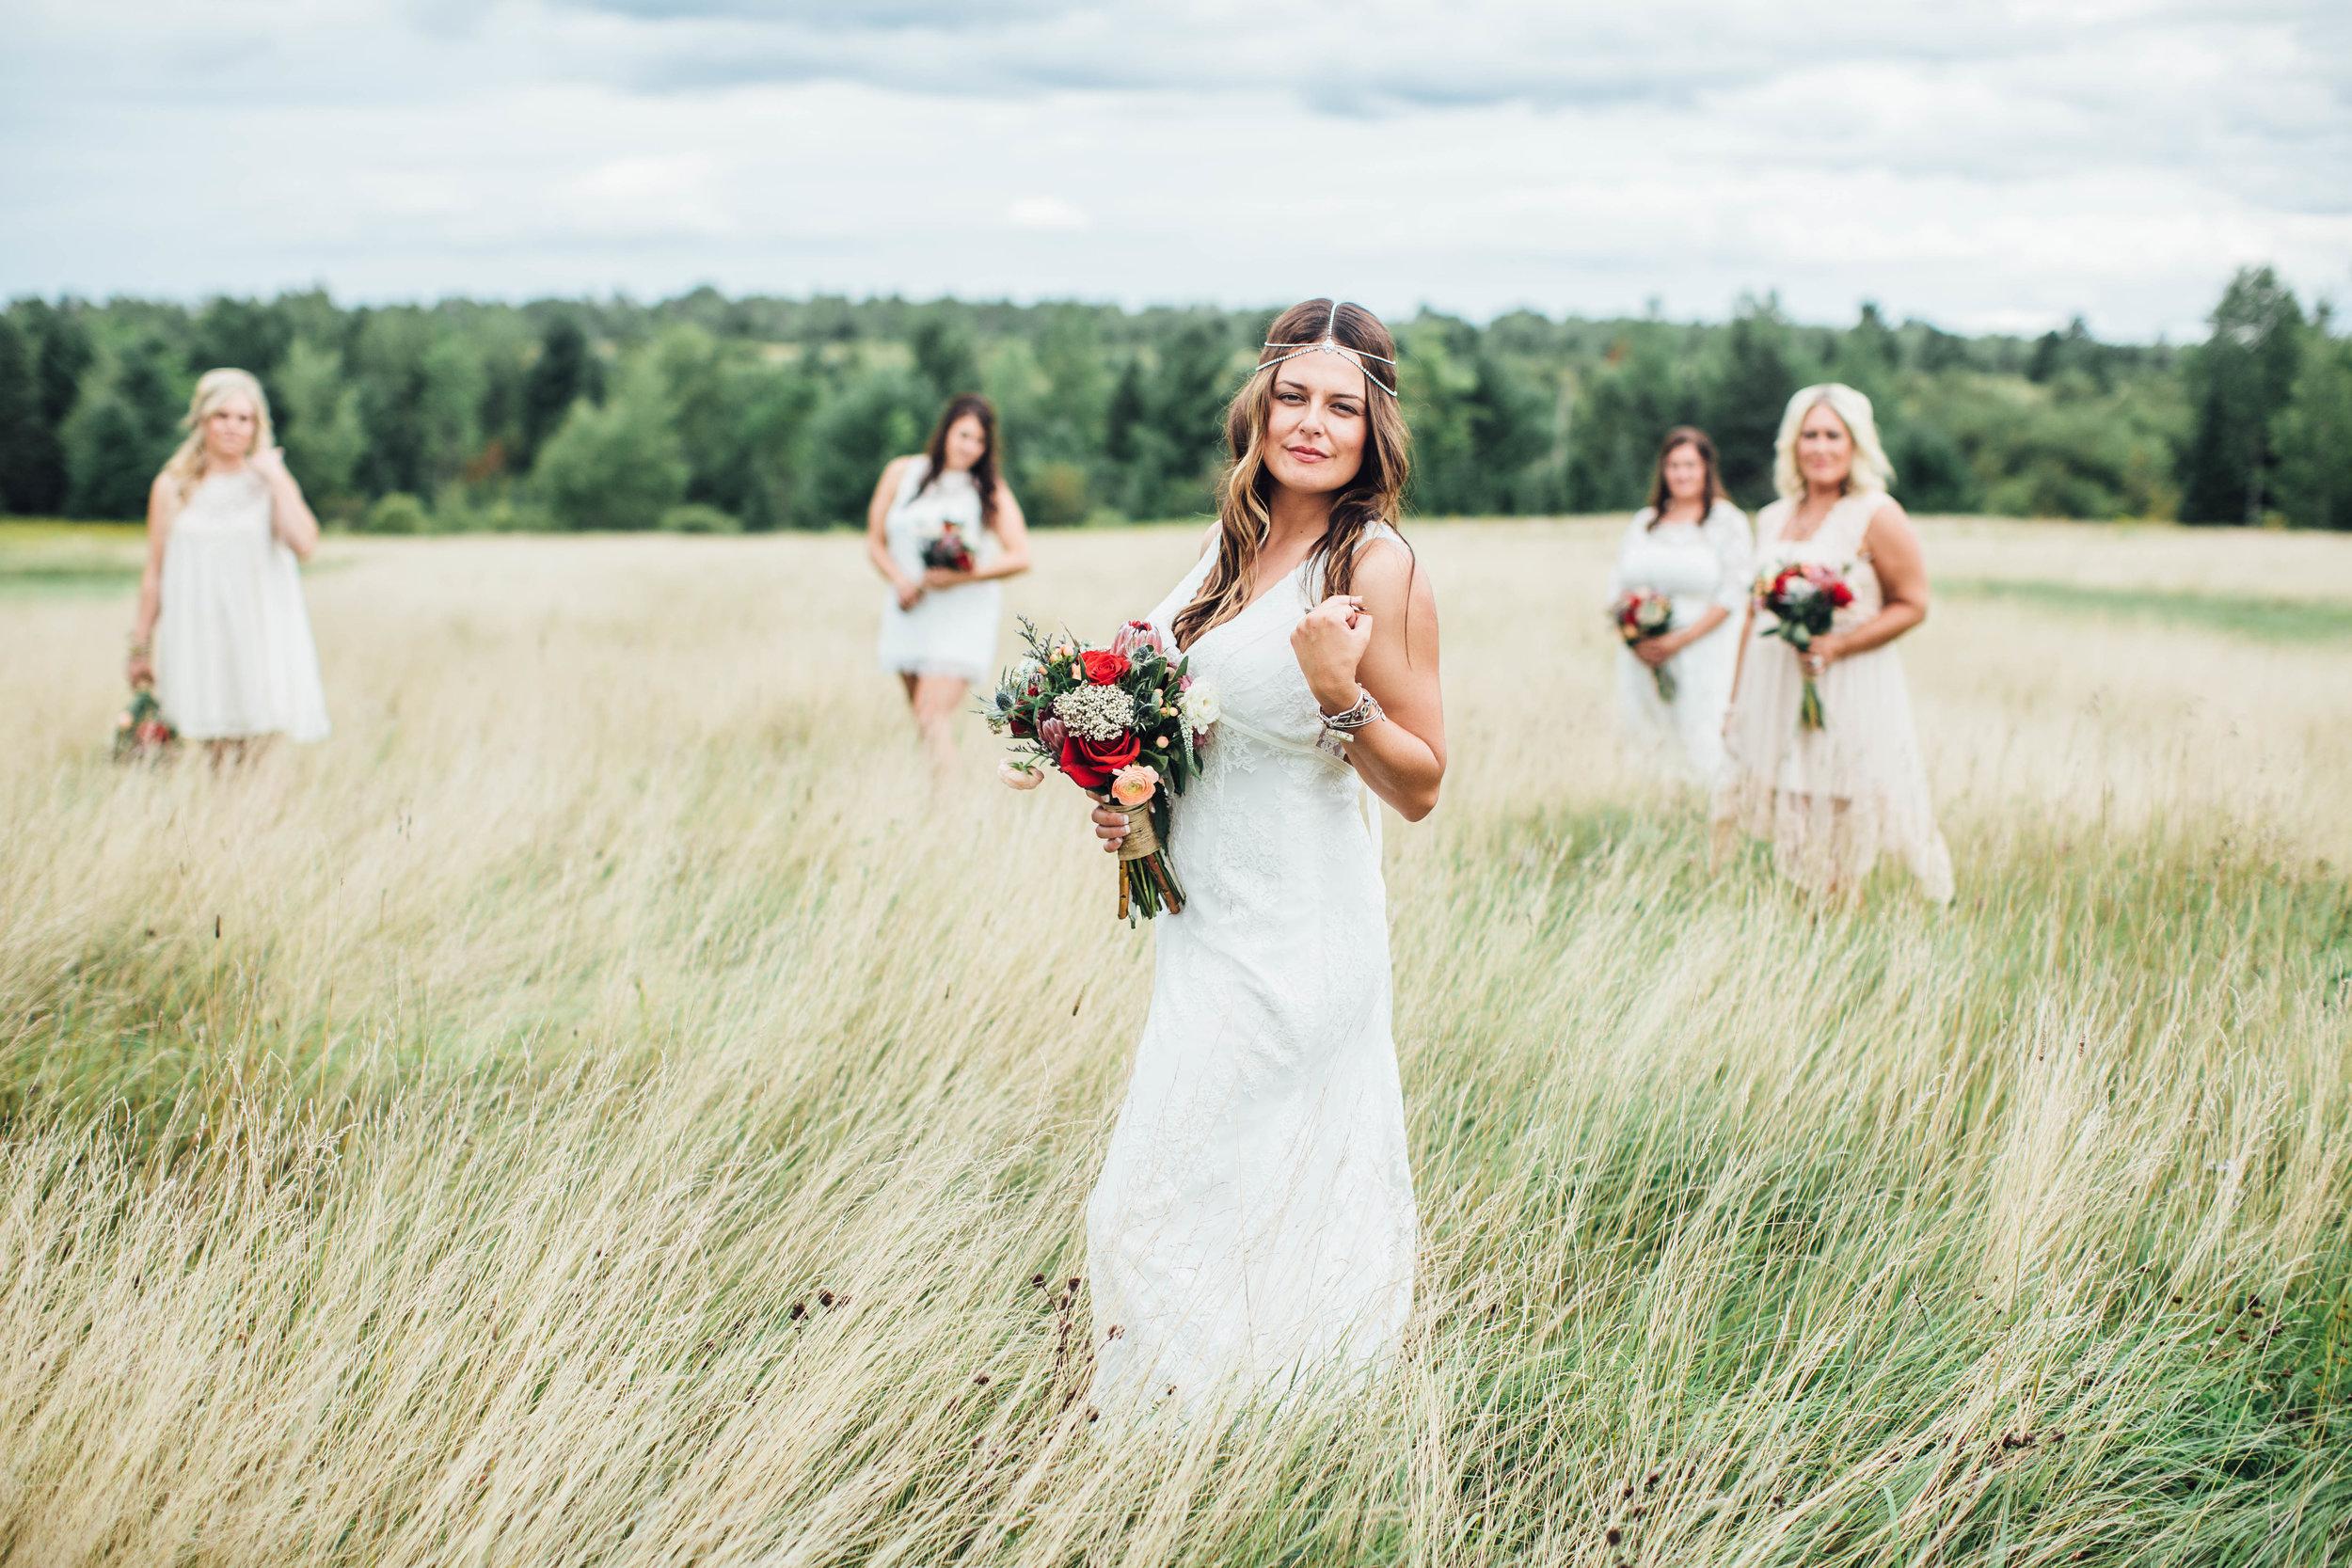 Bohemian Wedding - Sabrina Leigh Studios - Northern Michigan Wedding Photographer071.jpg